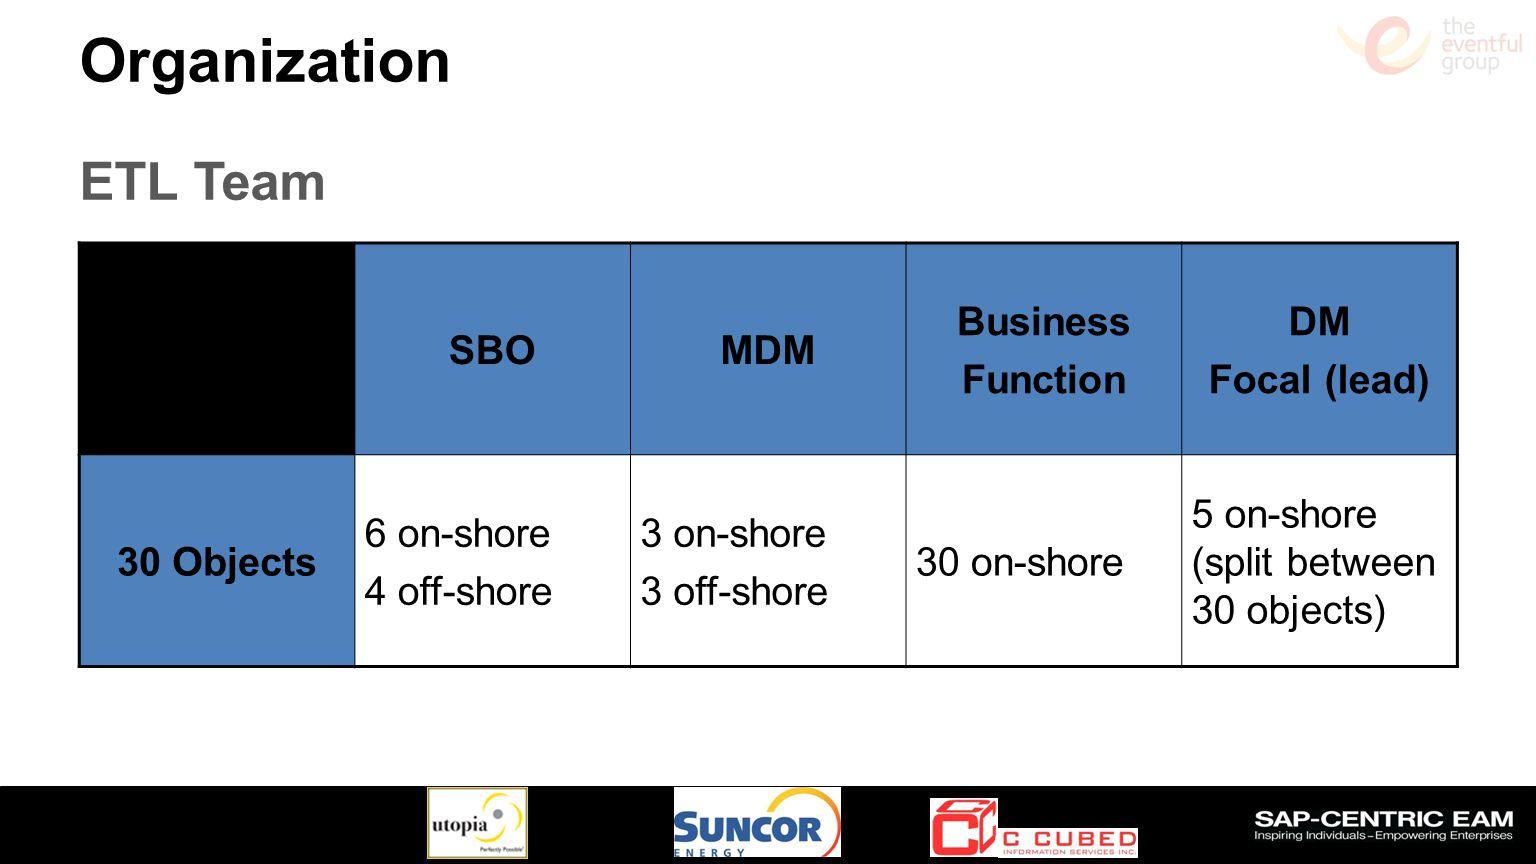 Slide 20 Organization ETL Team SBOMDM Business Function DM Focal (lead) 30 Objects 6 on-shore 4 off-shore 3 on-shore 3 off-shore 30 on-shore 5 on-shor